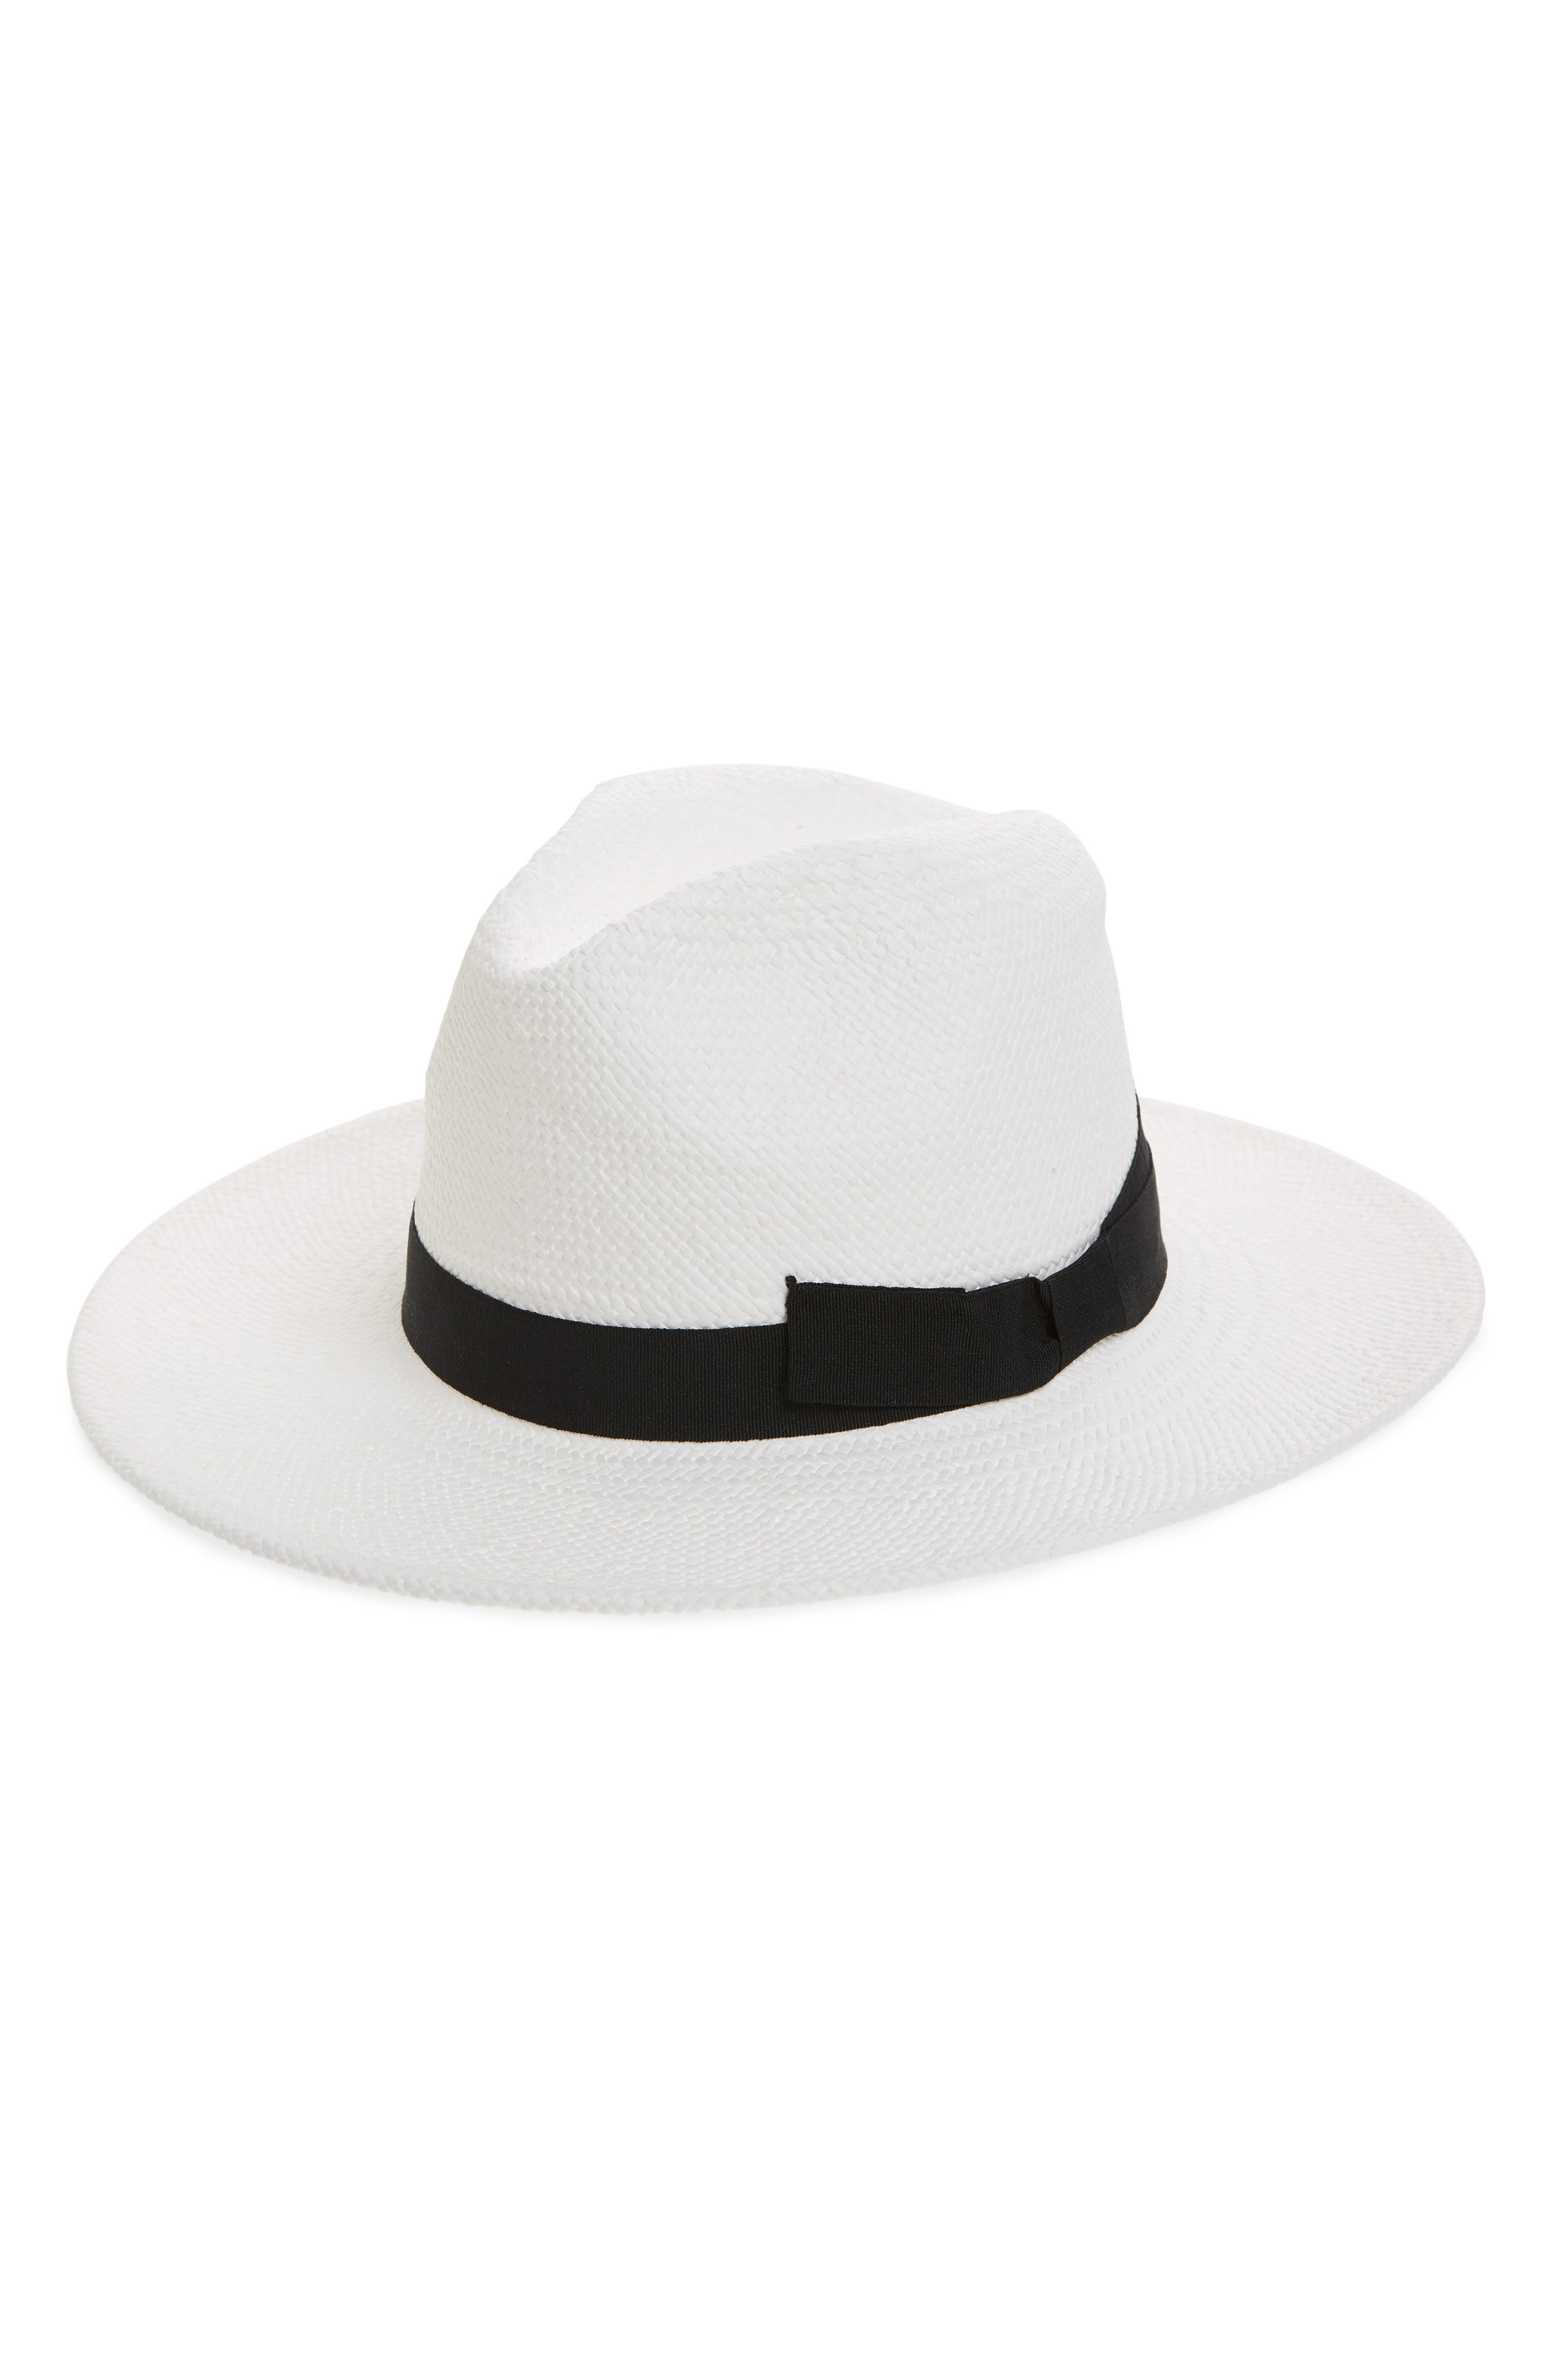 HALOGEN<SUP>®</SUP>, Woven Panama Hat, Main thumbnail 1, color, WHITE